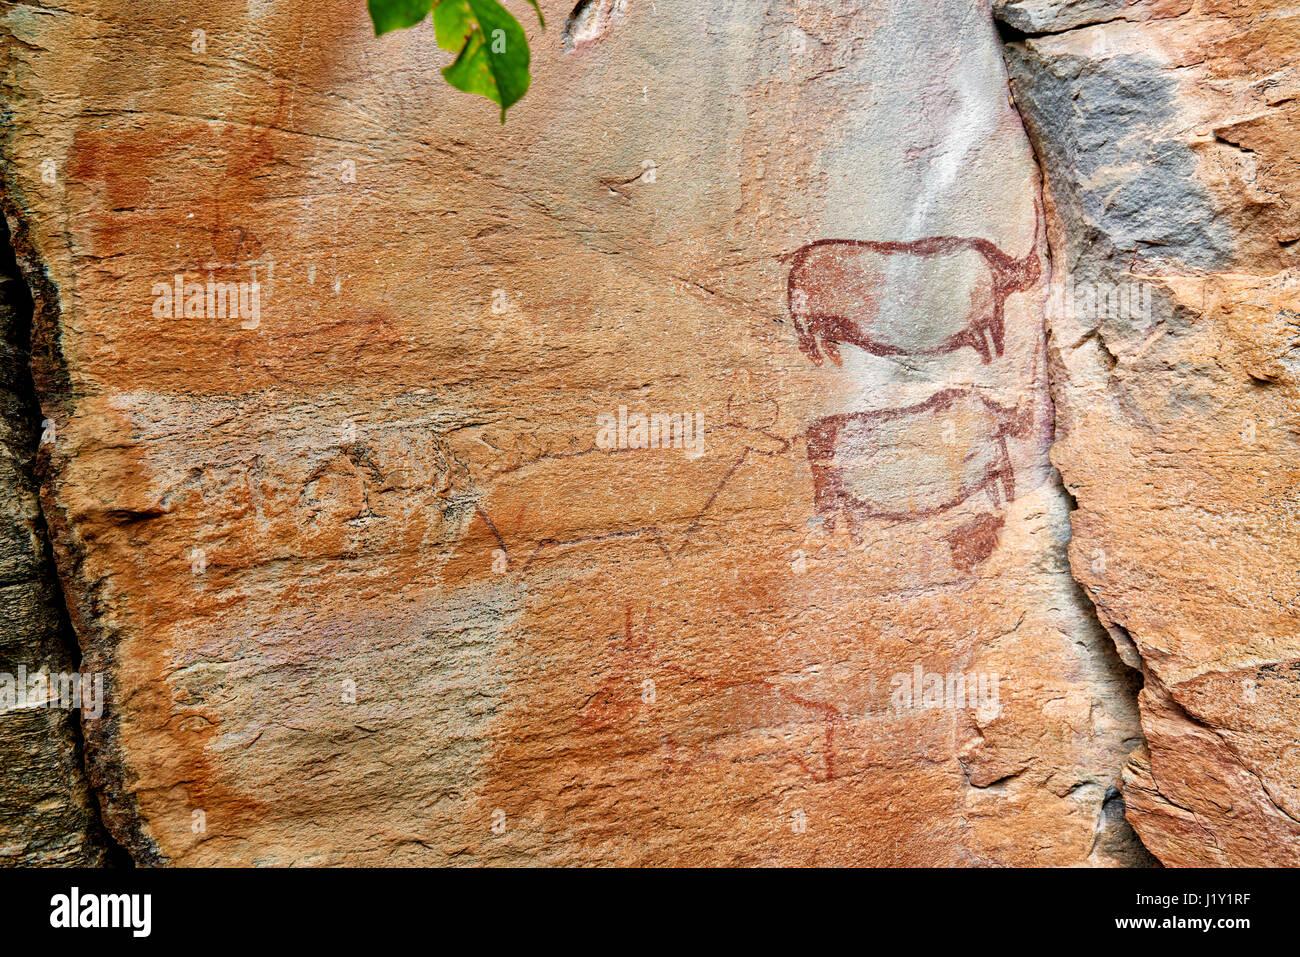 Rhinos and a cow-like figure, Rock art, ancient San paintings, Tsodilo Hills, UNESCO world heritage site, Botswana, - Stock Image